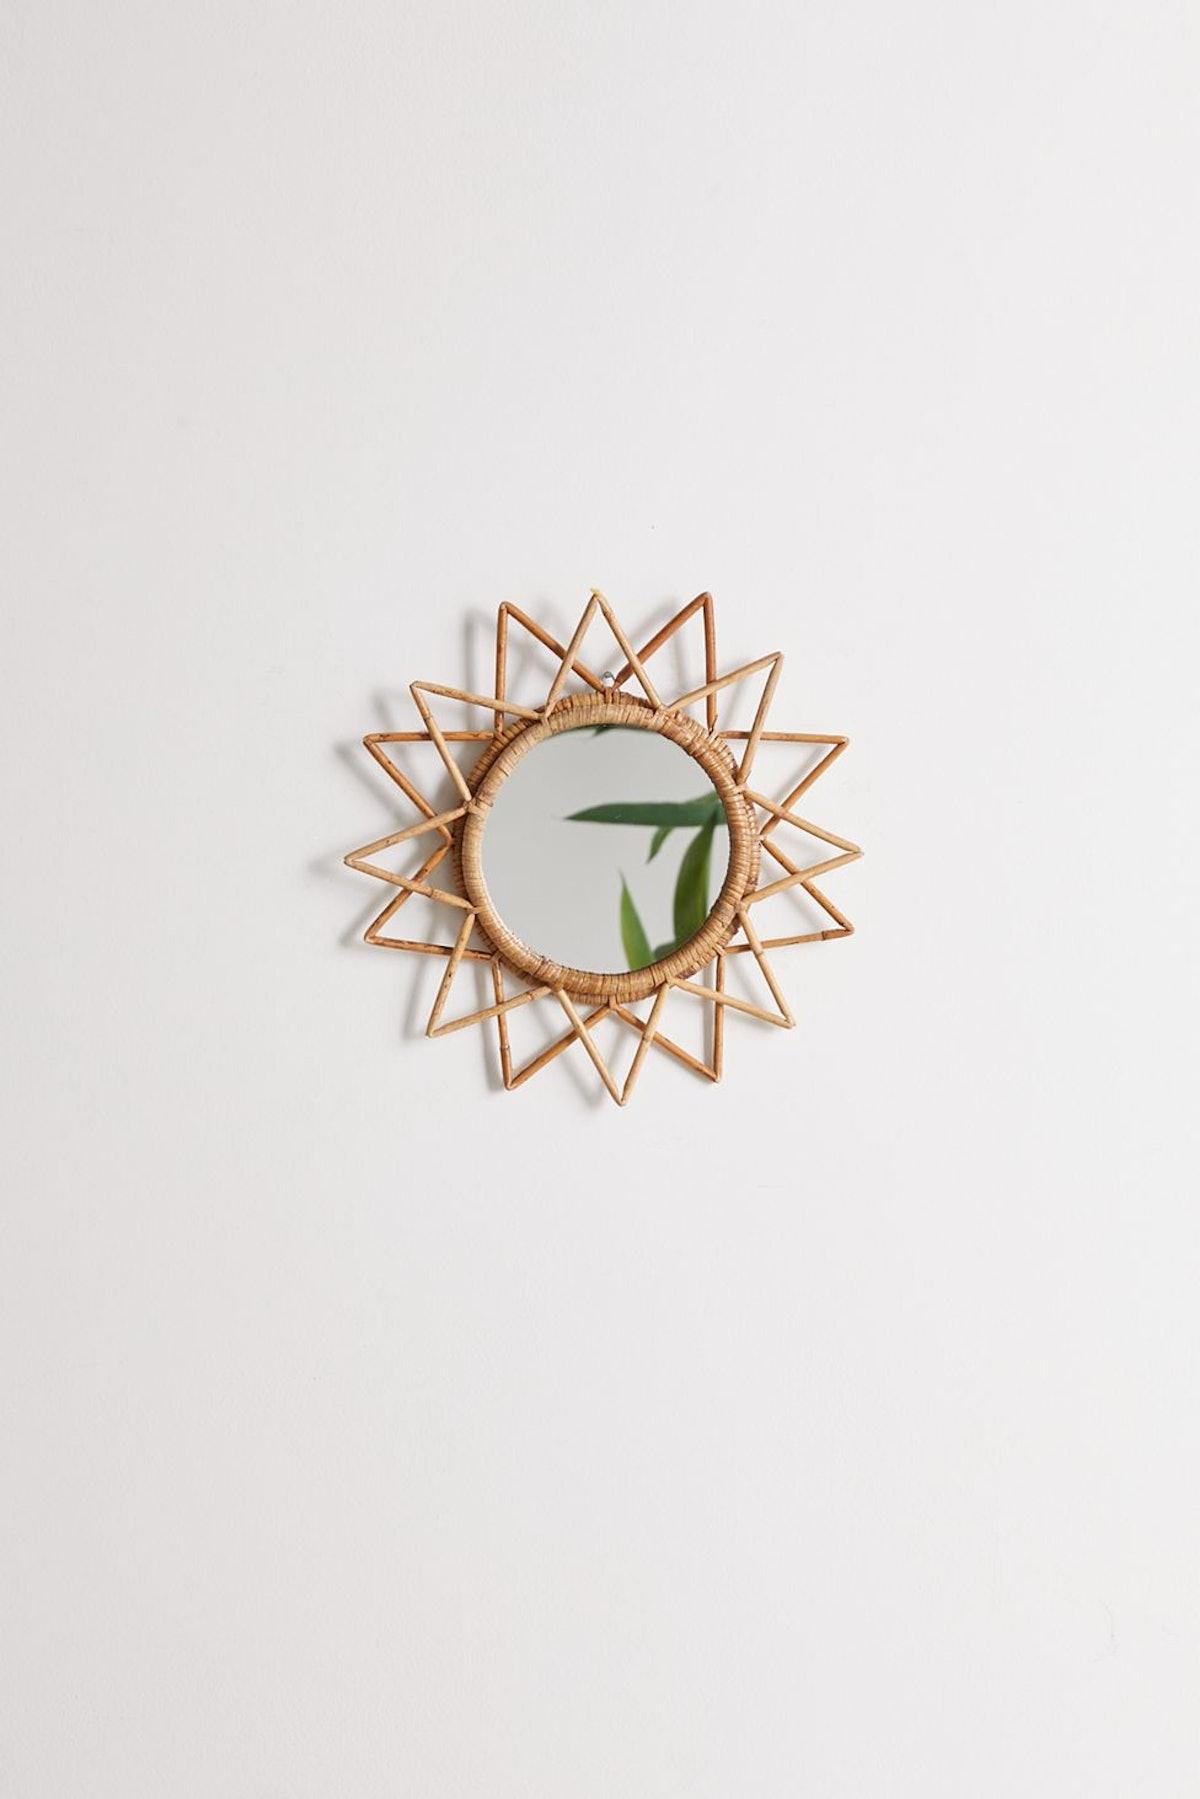 Magical Thinking Woven Wall Mirror, Sun